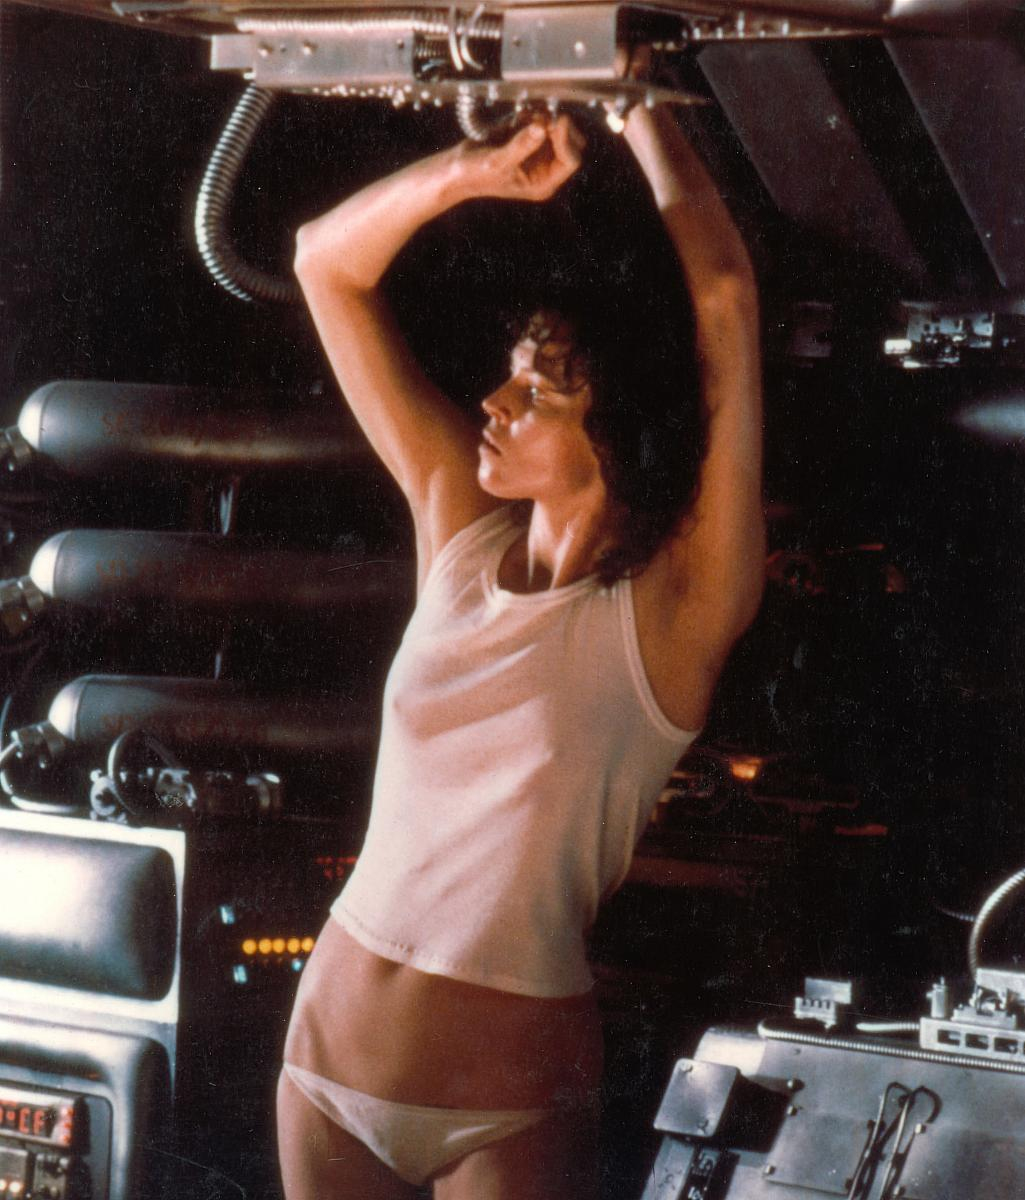 http://4.bp.blogspot.com/-CbiVc9dFyPQ/TuEnRJ6wzxI/AAAAAAAABBQ/QqvQ0u17vOw/s1600/alien_underwear.jpg